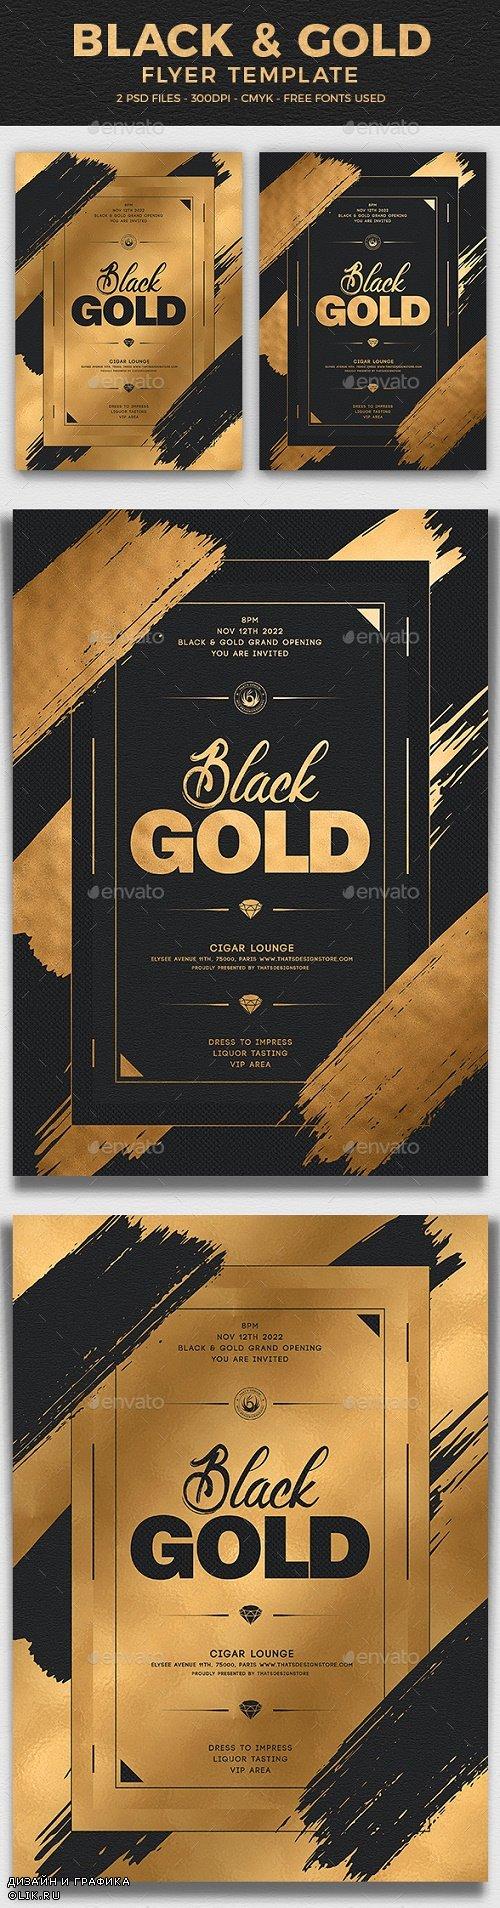 Black and Gold Flyer Template V15 - 25121989 - 4321812